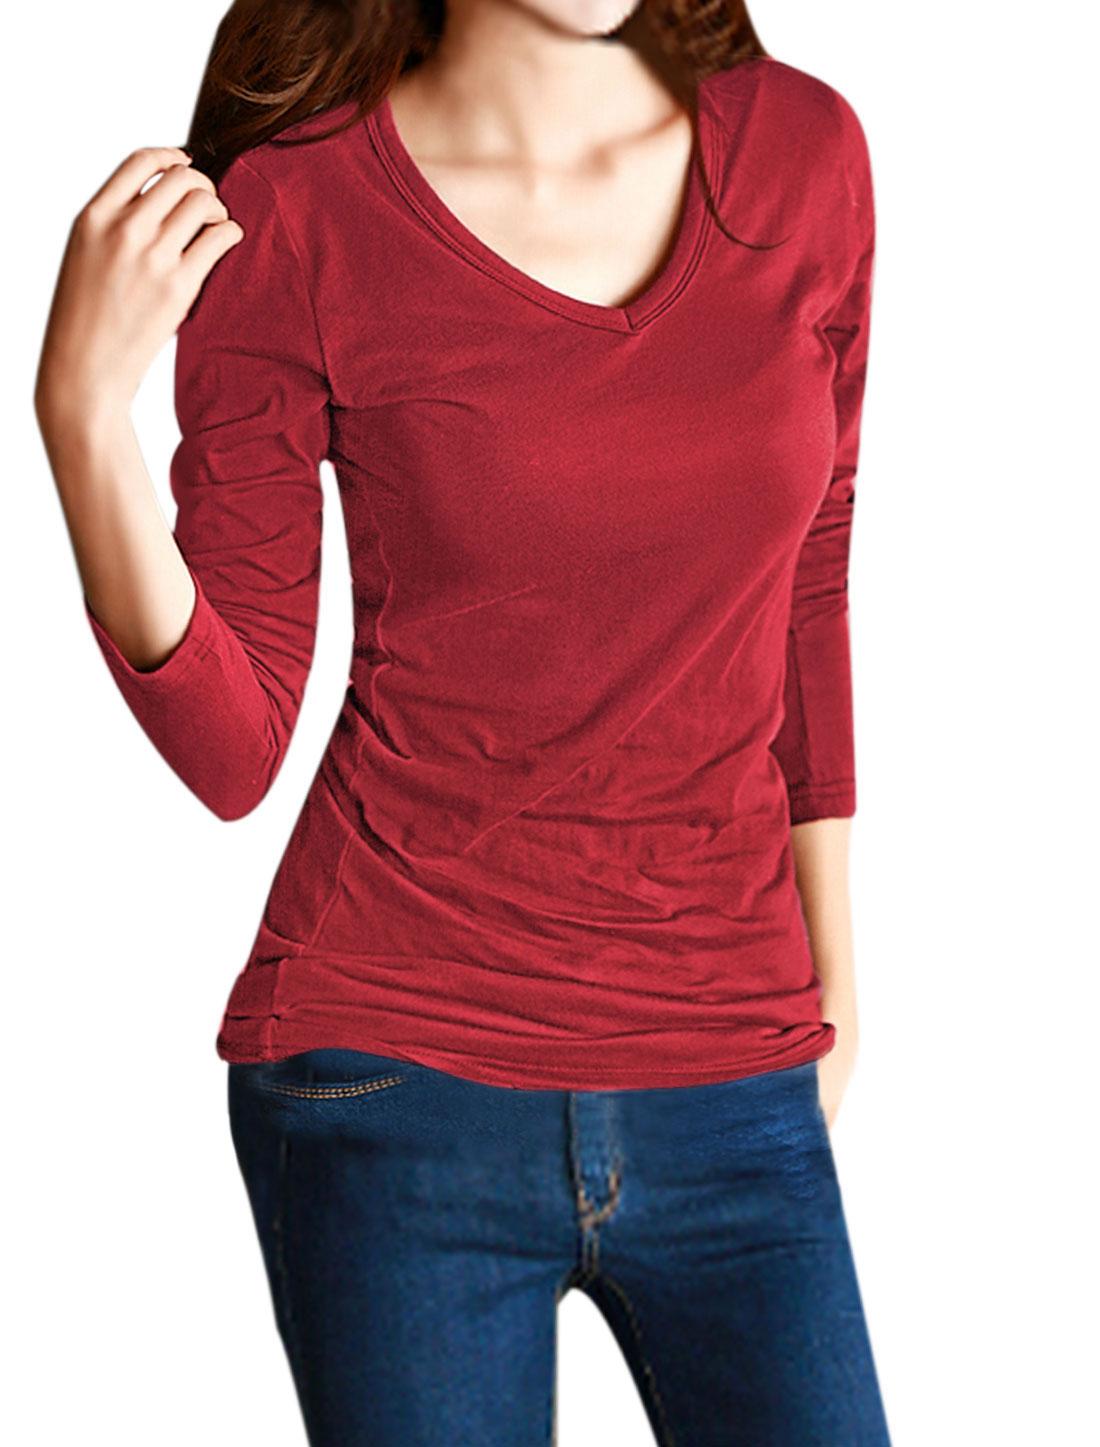 Ladies Long Sleeves V Neckline Slim Fit Tee Shirt Red S